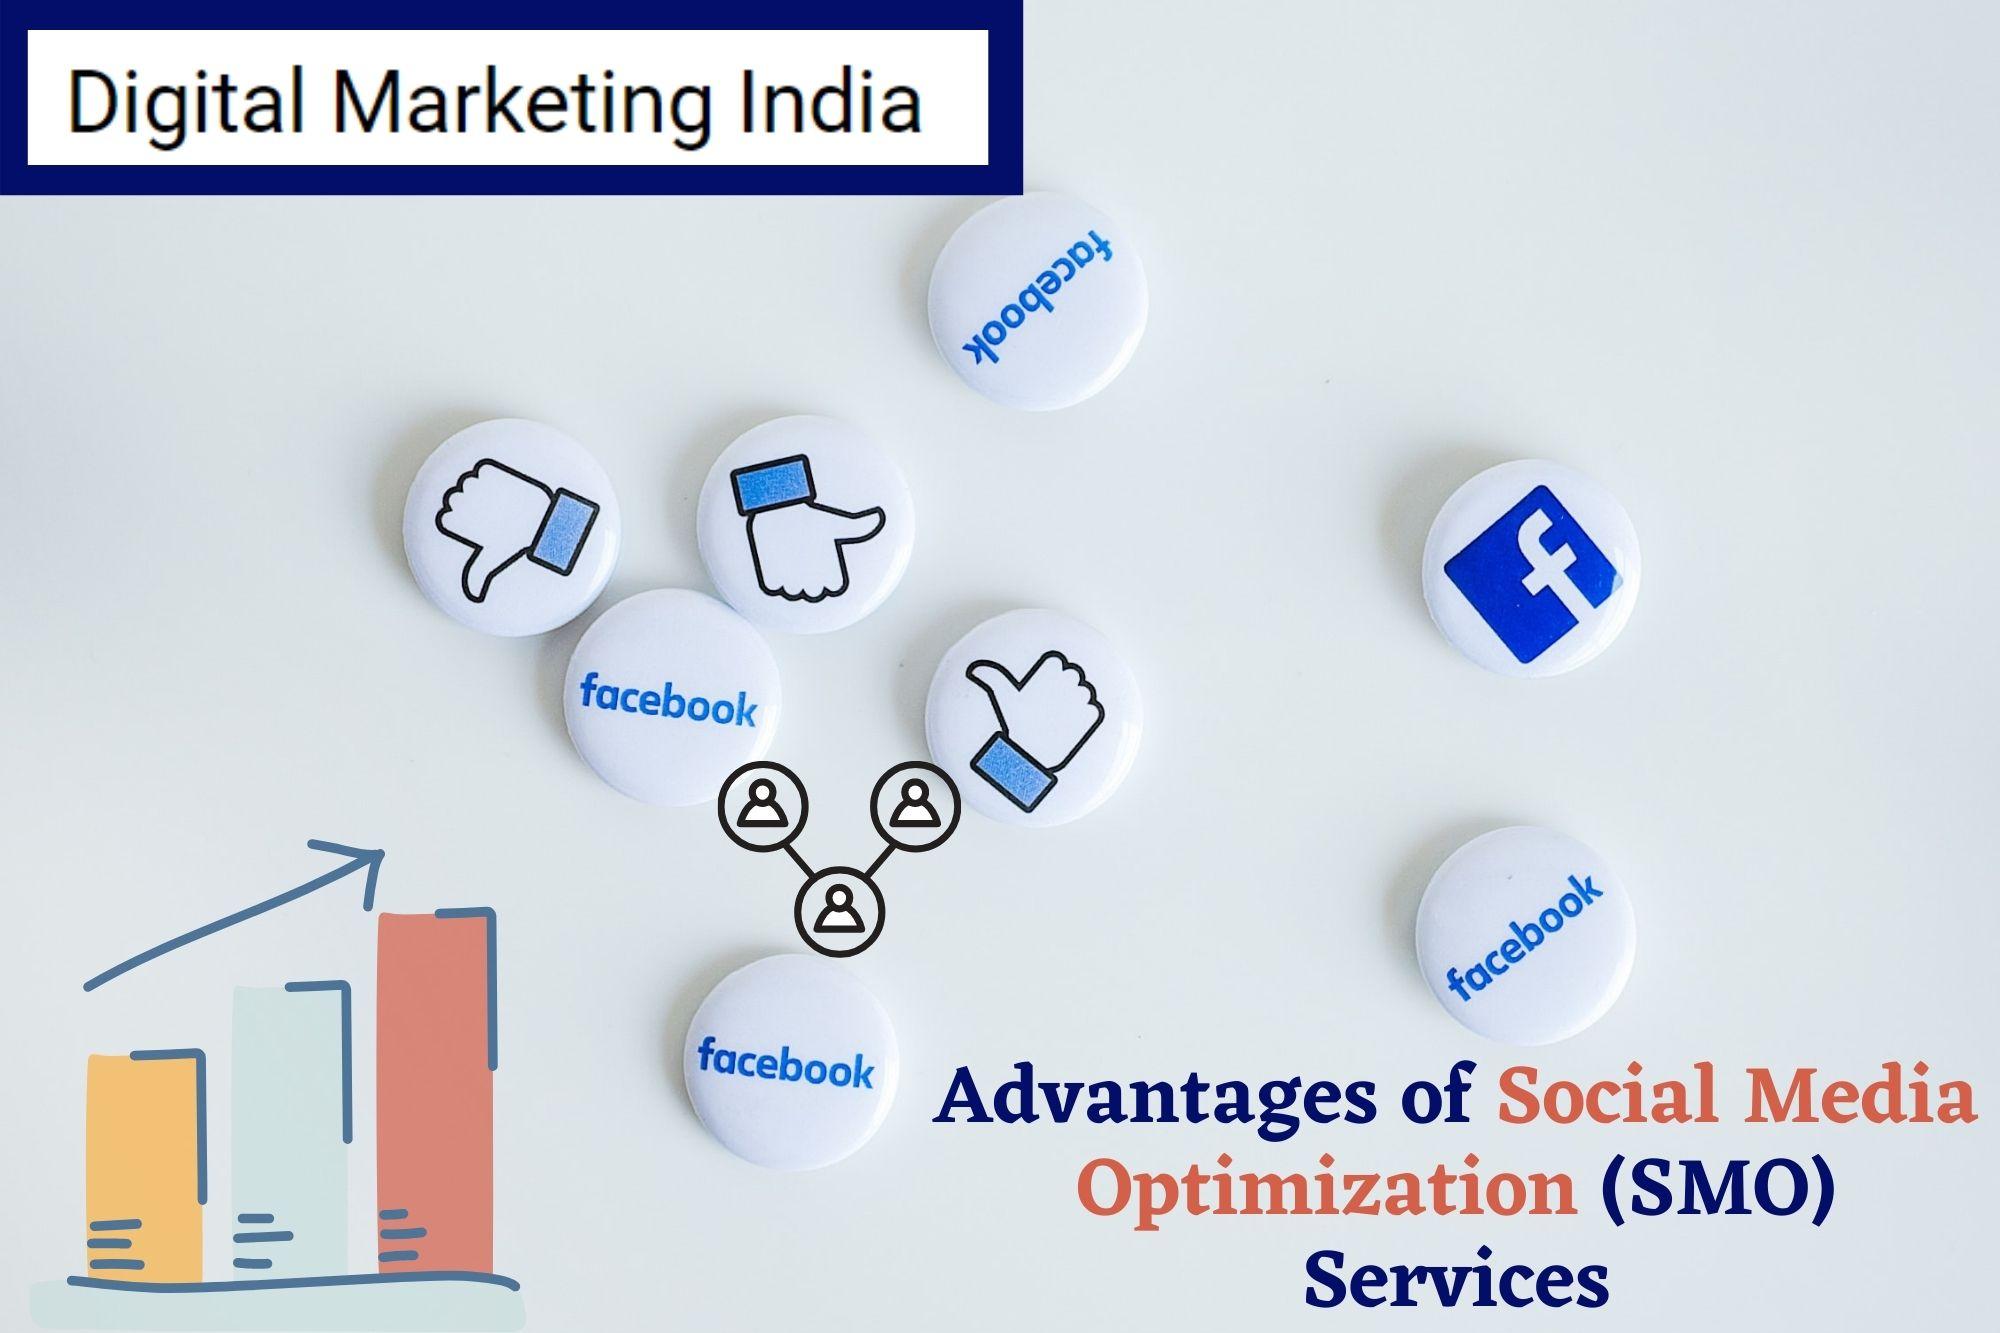 Advantages of Social Media Optimization (SMO) Services